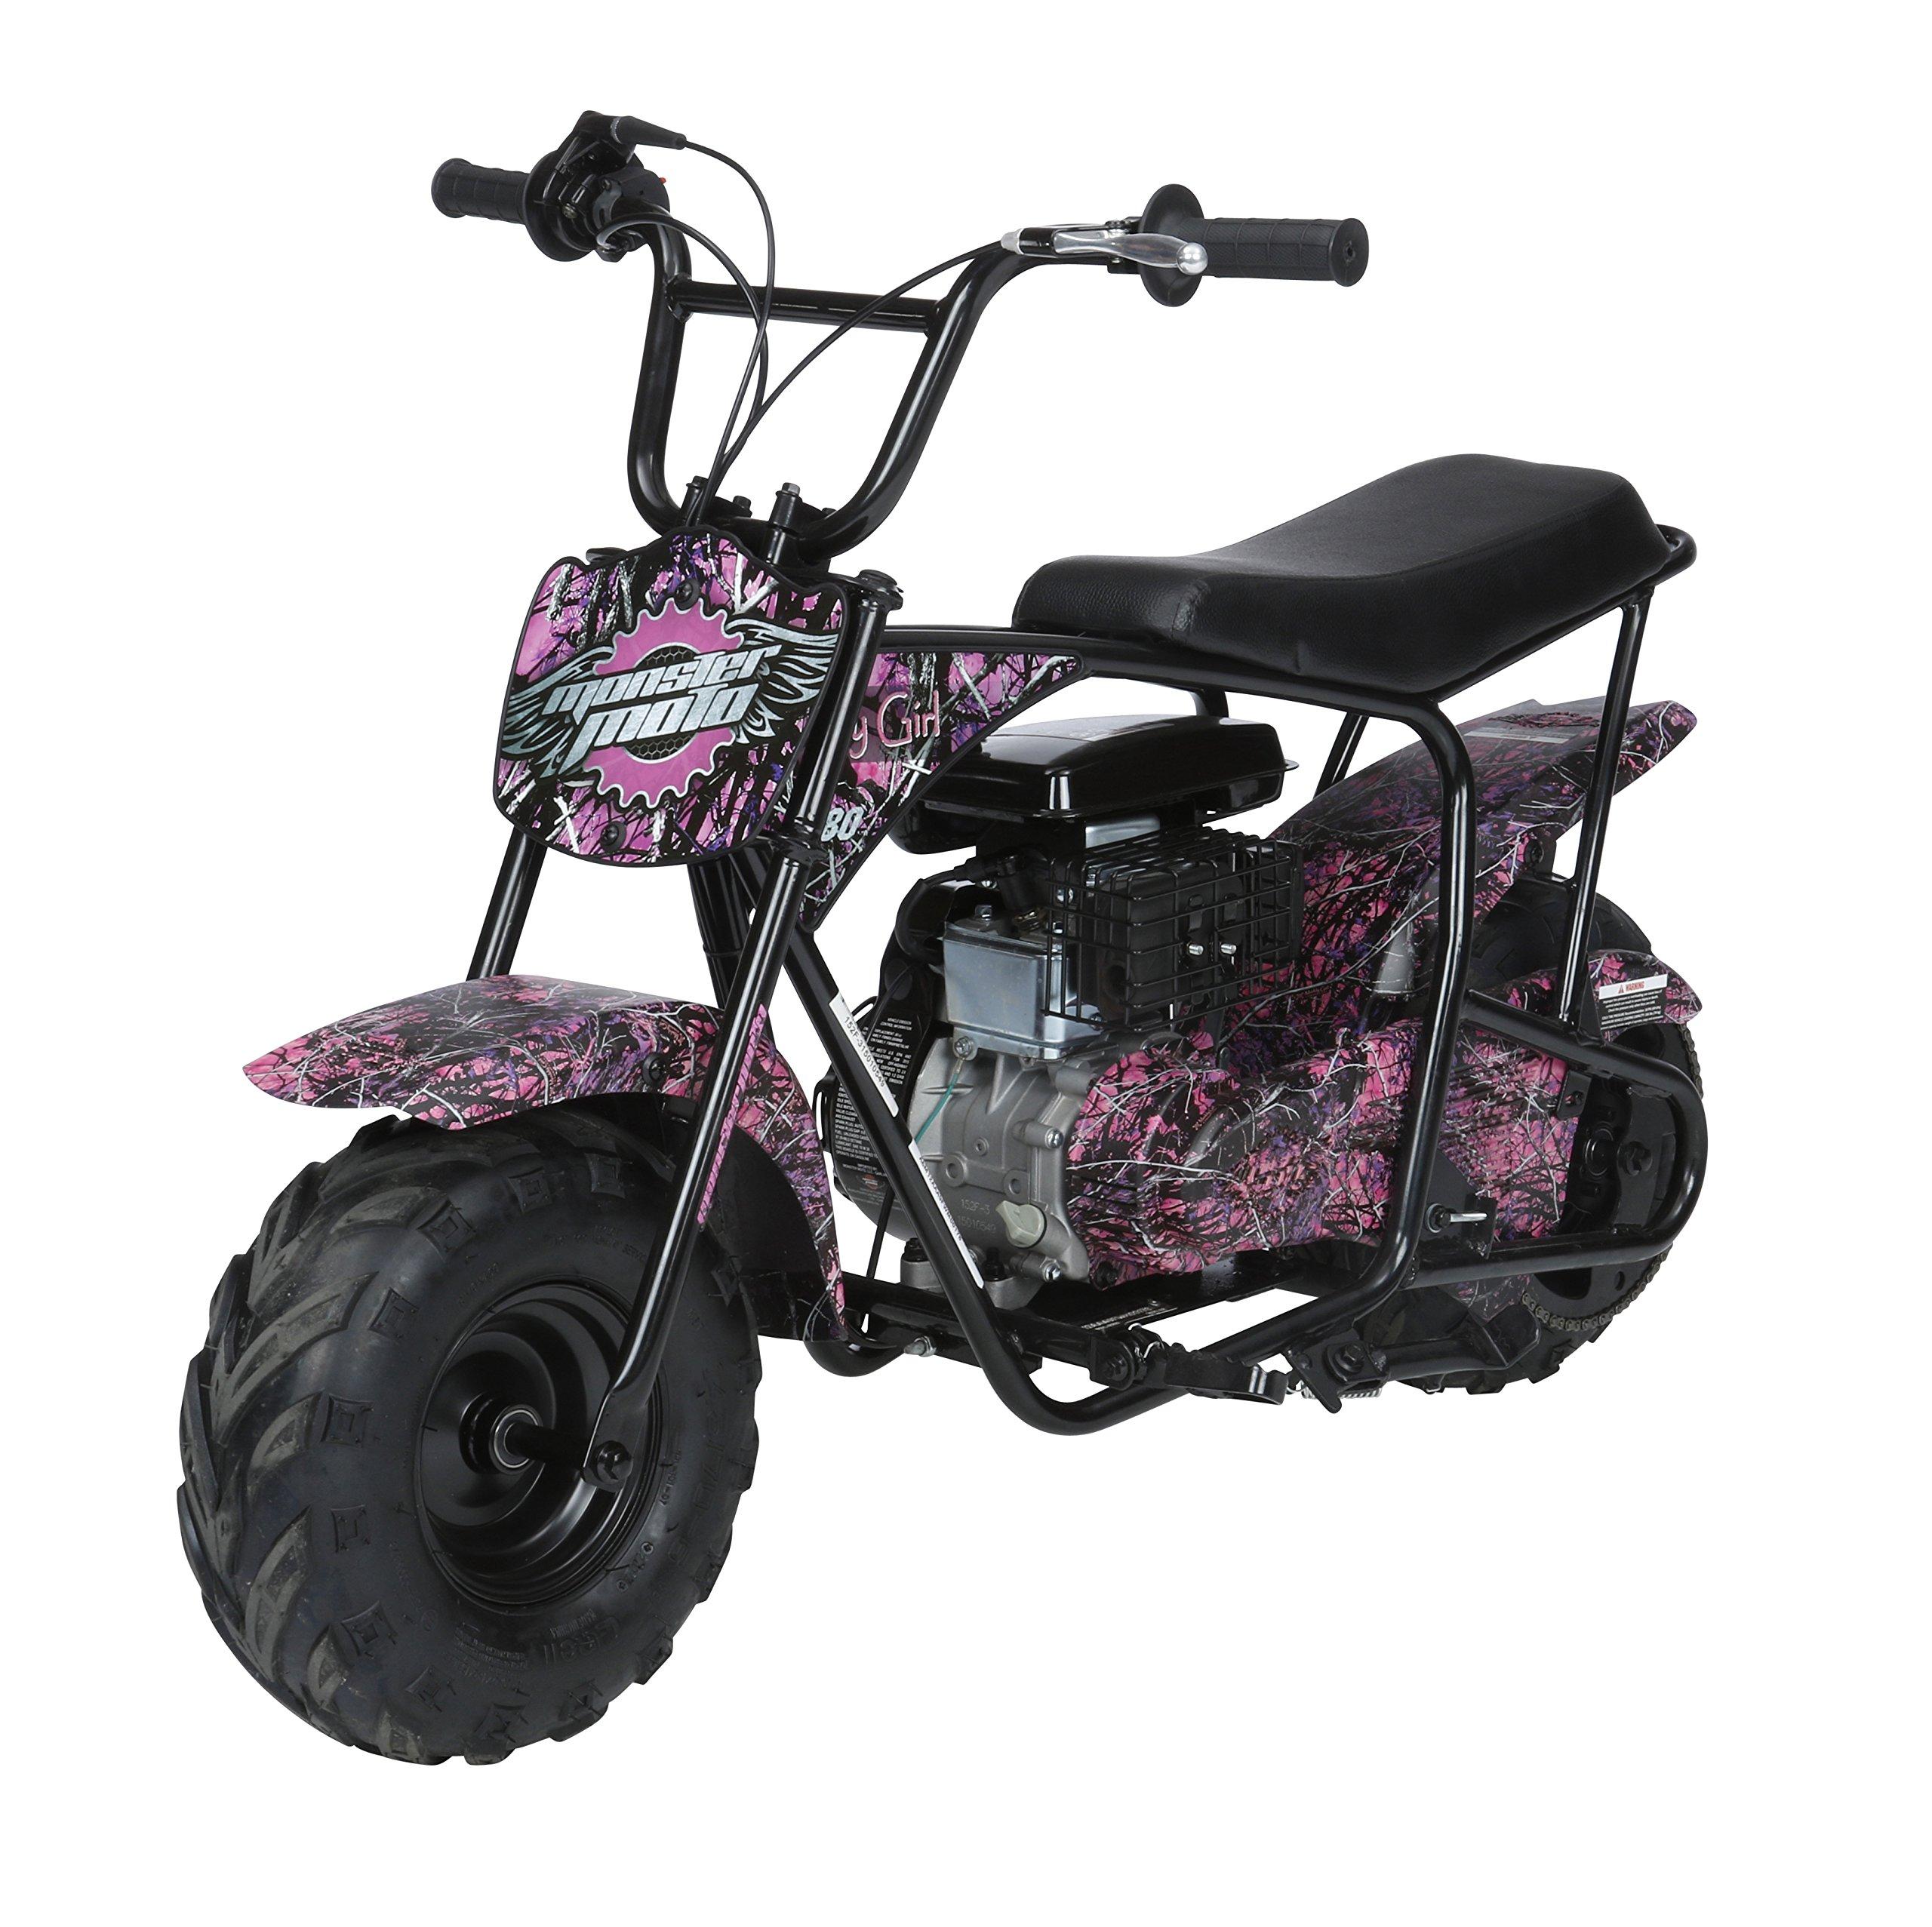 Monster Moto MM-B80-MG Black/Pink 80CC Youth Mini Bike (Muddy Girl Pink),1 Pack